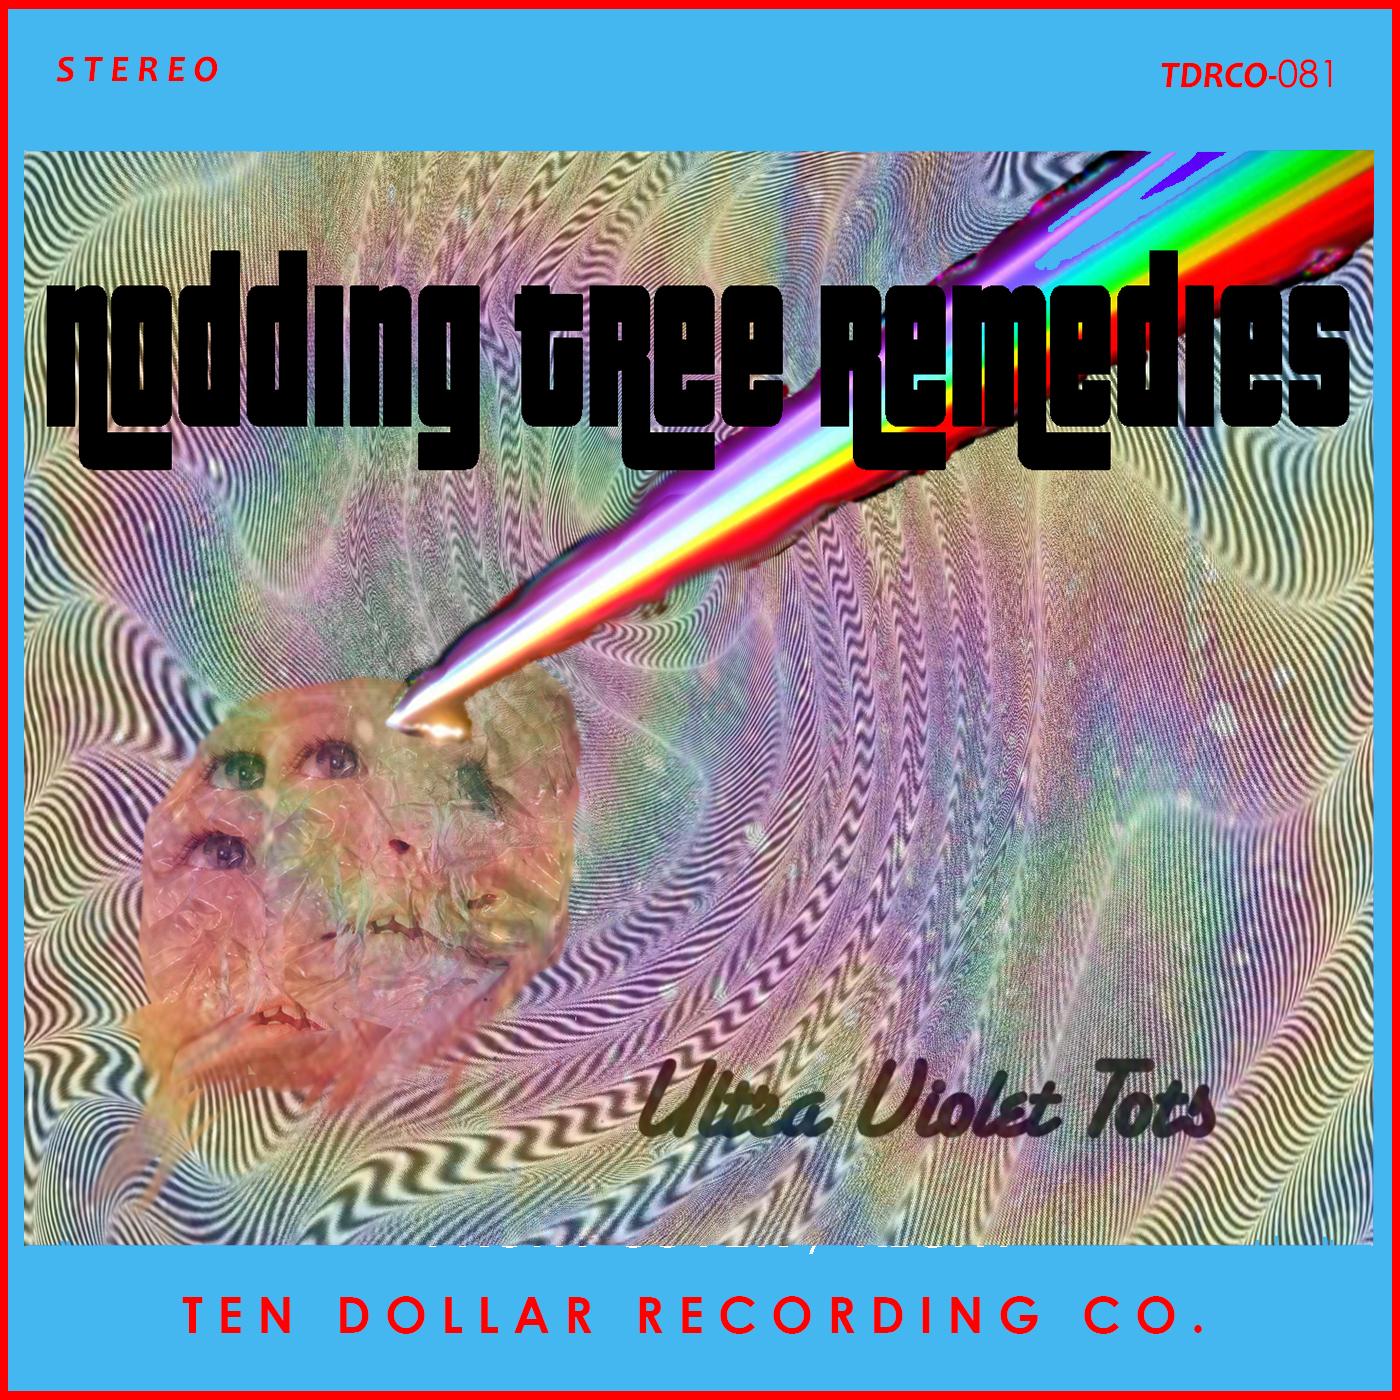 Nodding Tree Remedies - Ultra Violet Tots